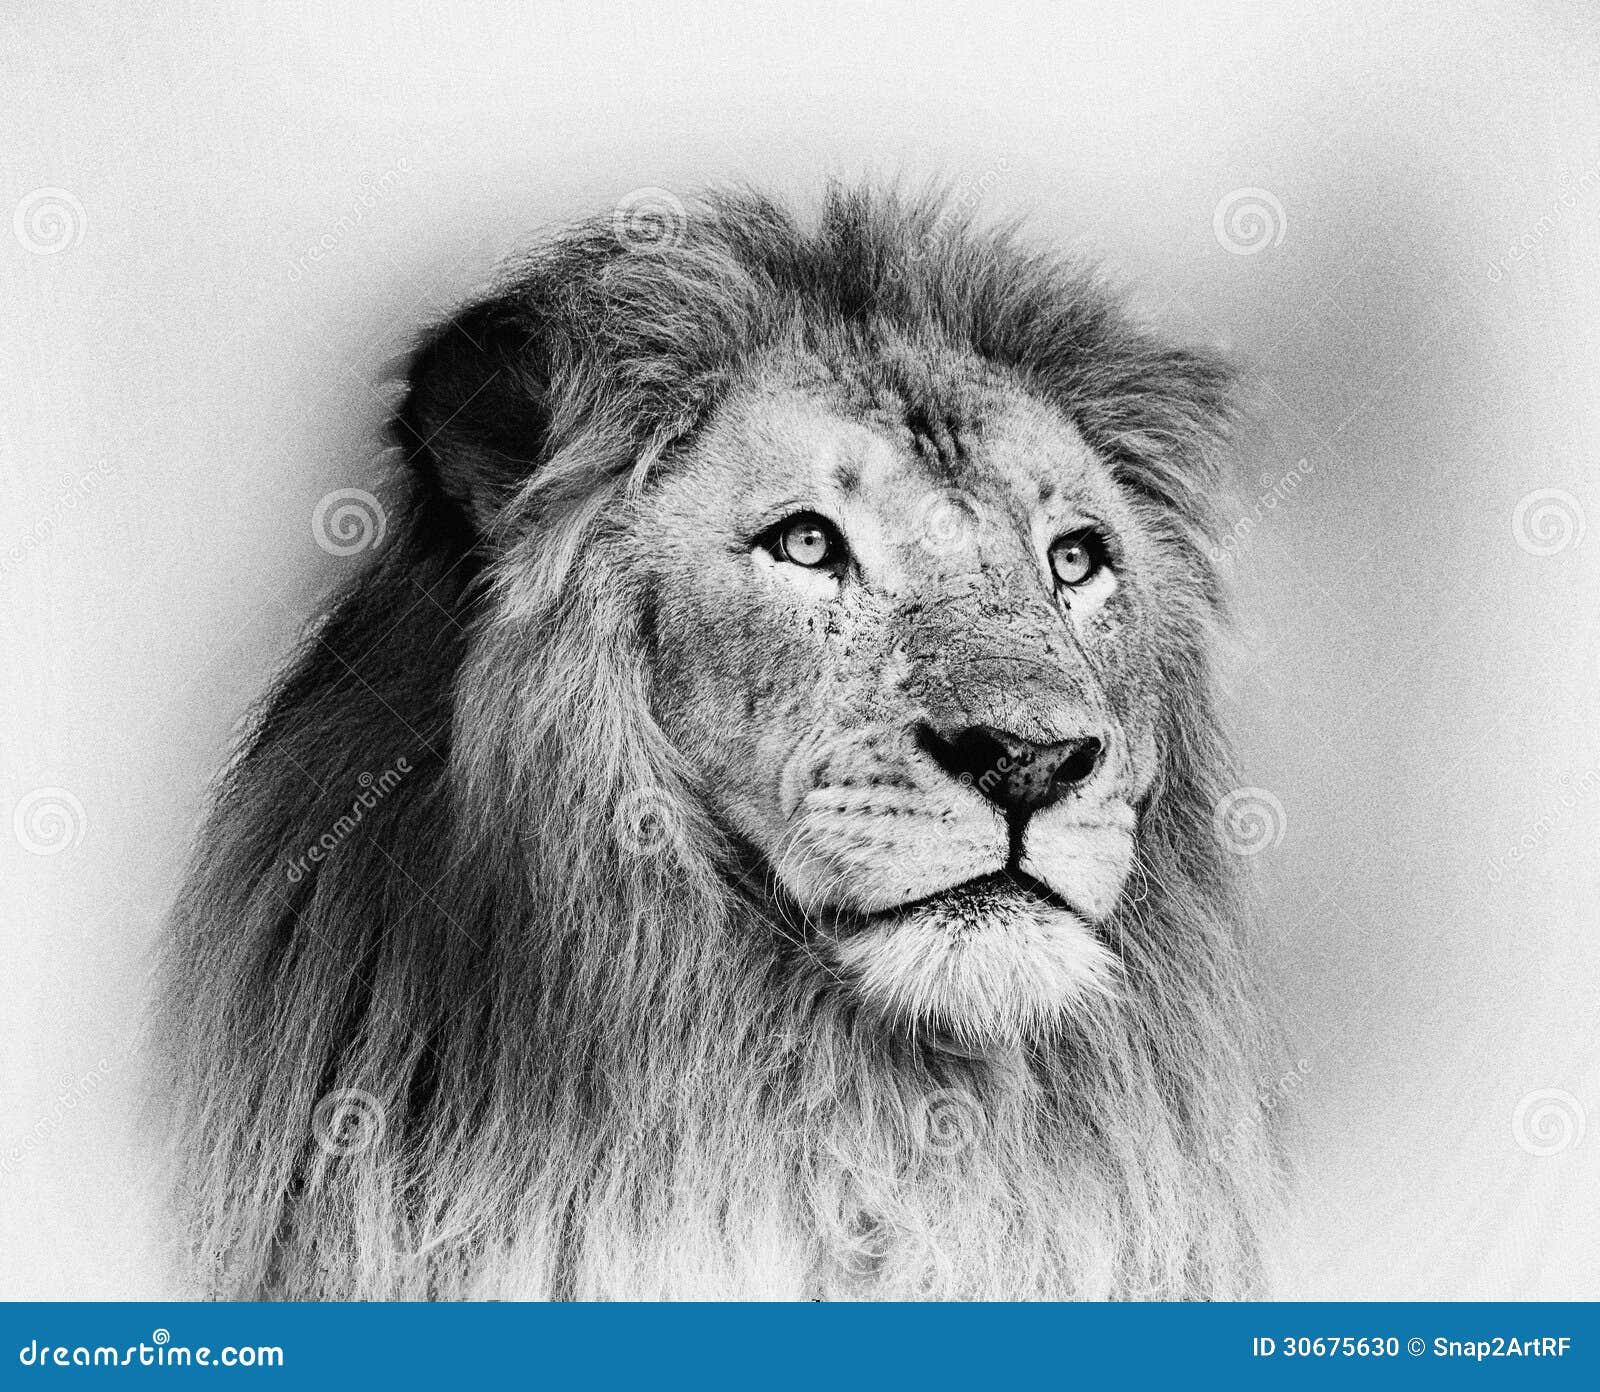 White lion face images - photo#11